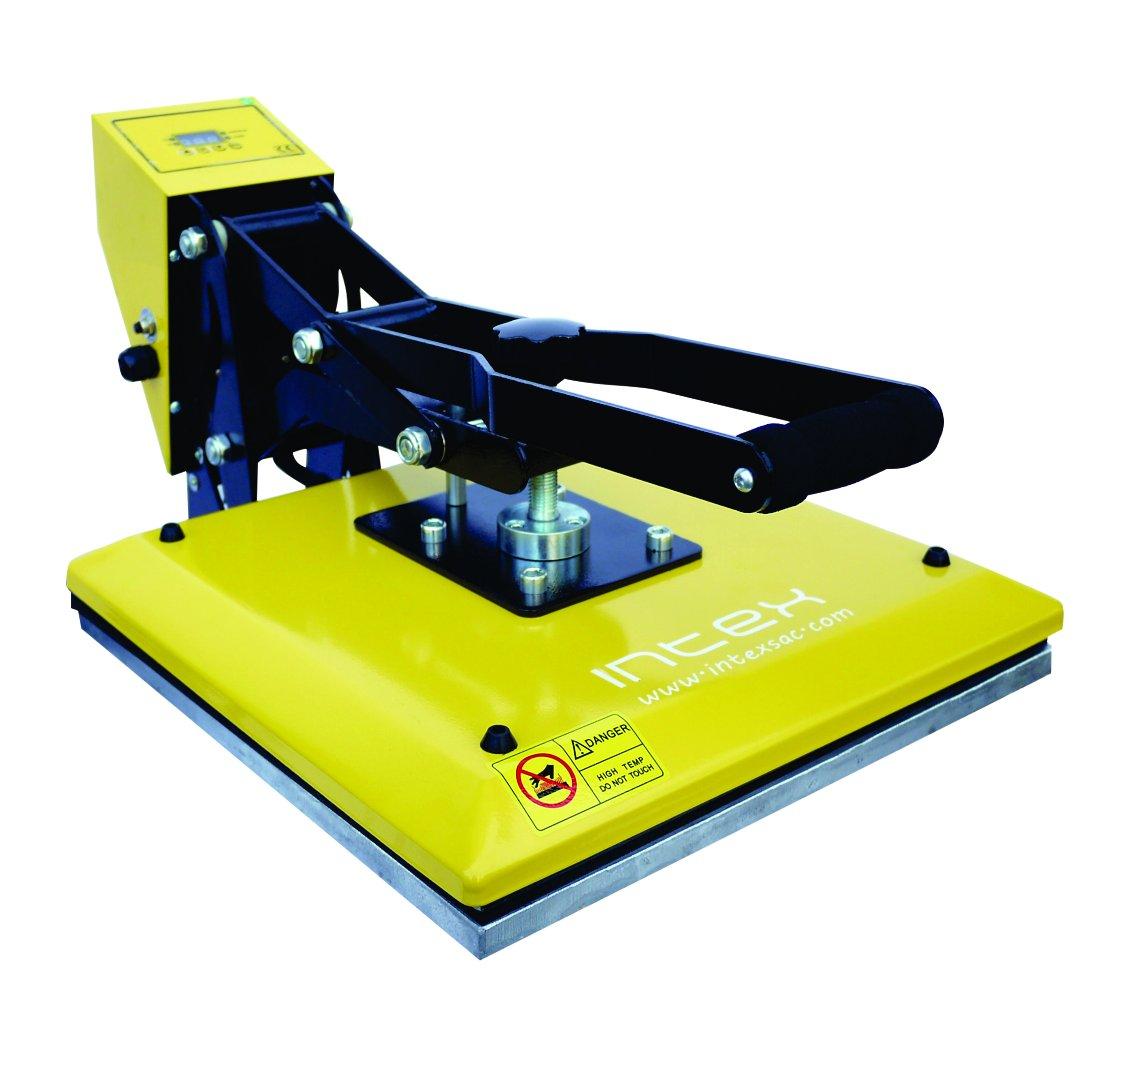 Best 15 Sublimation Heat Transfer Press Machines 2019 2020